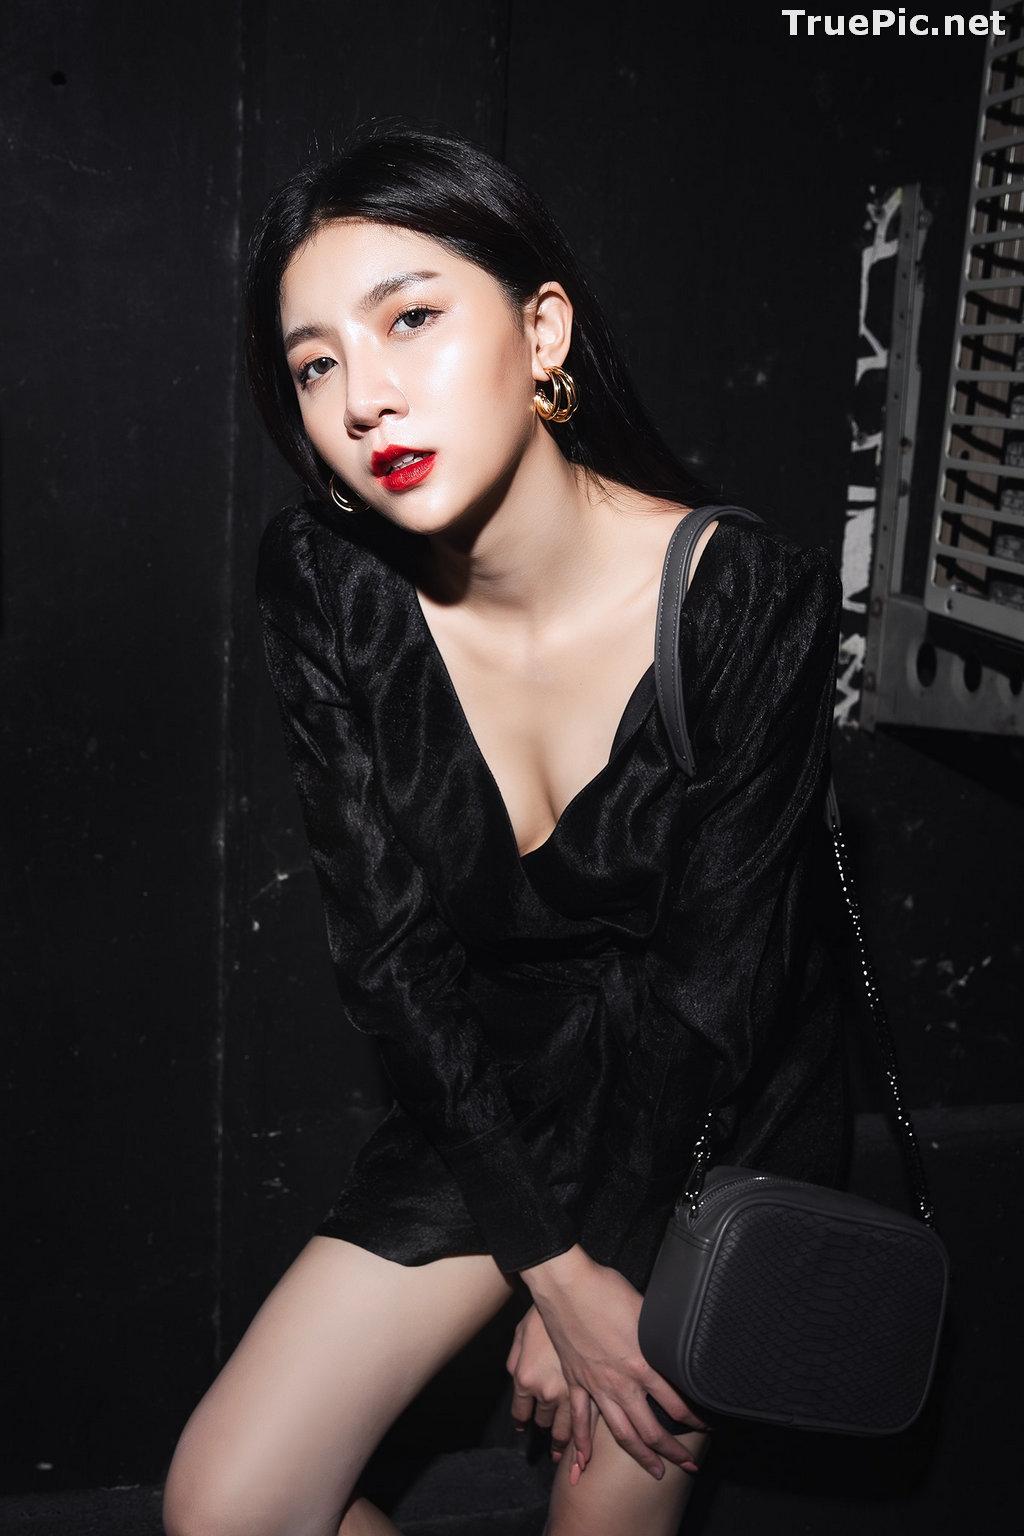 Image Thailand Model - Sasi Ngiunwan - Black For SiamNight - TruePic.net - Picture-5